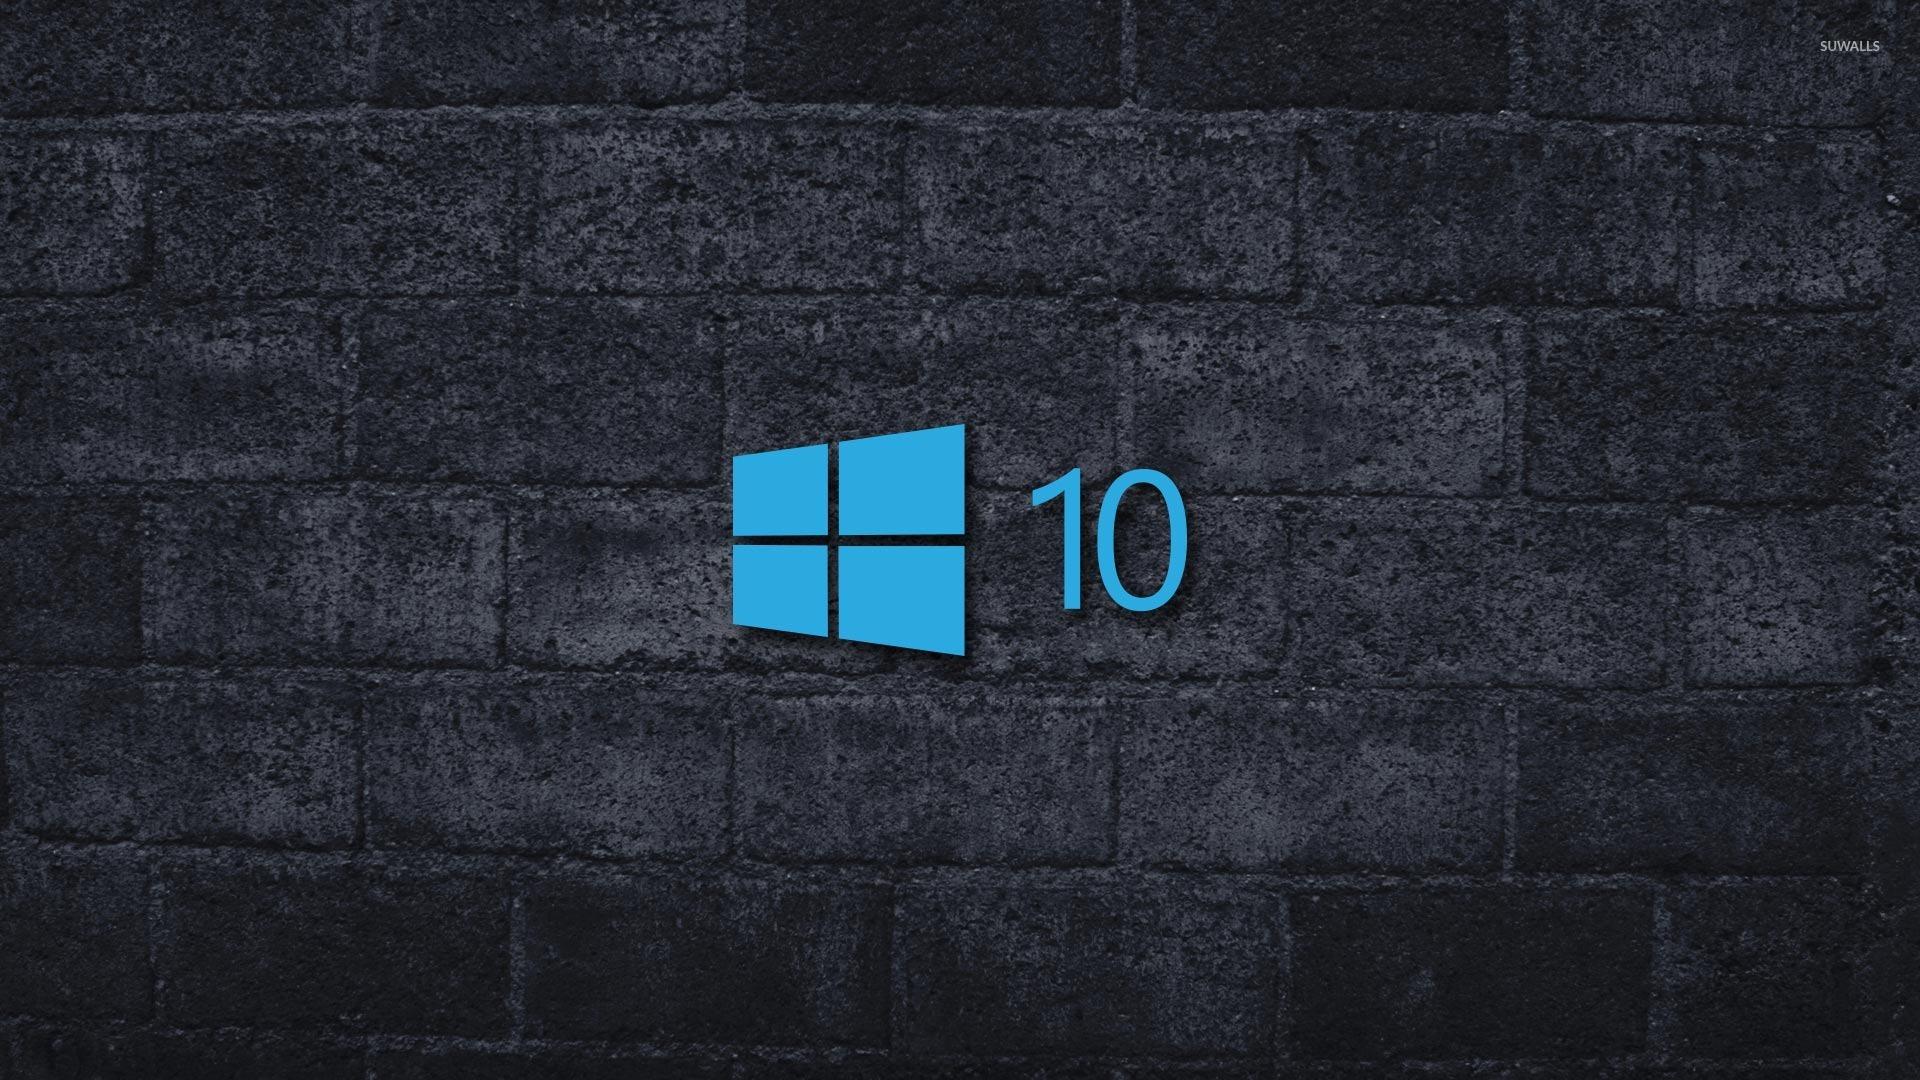 Windows 10 On The Gray Brick Wall [4] Wallpaper